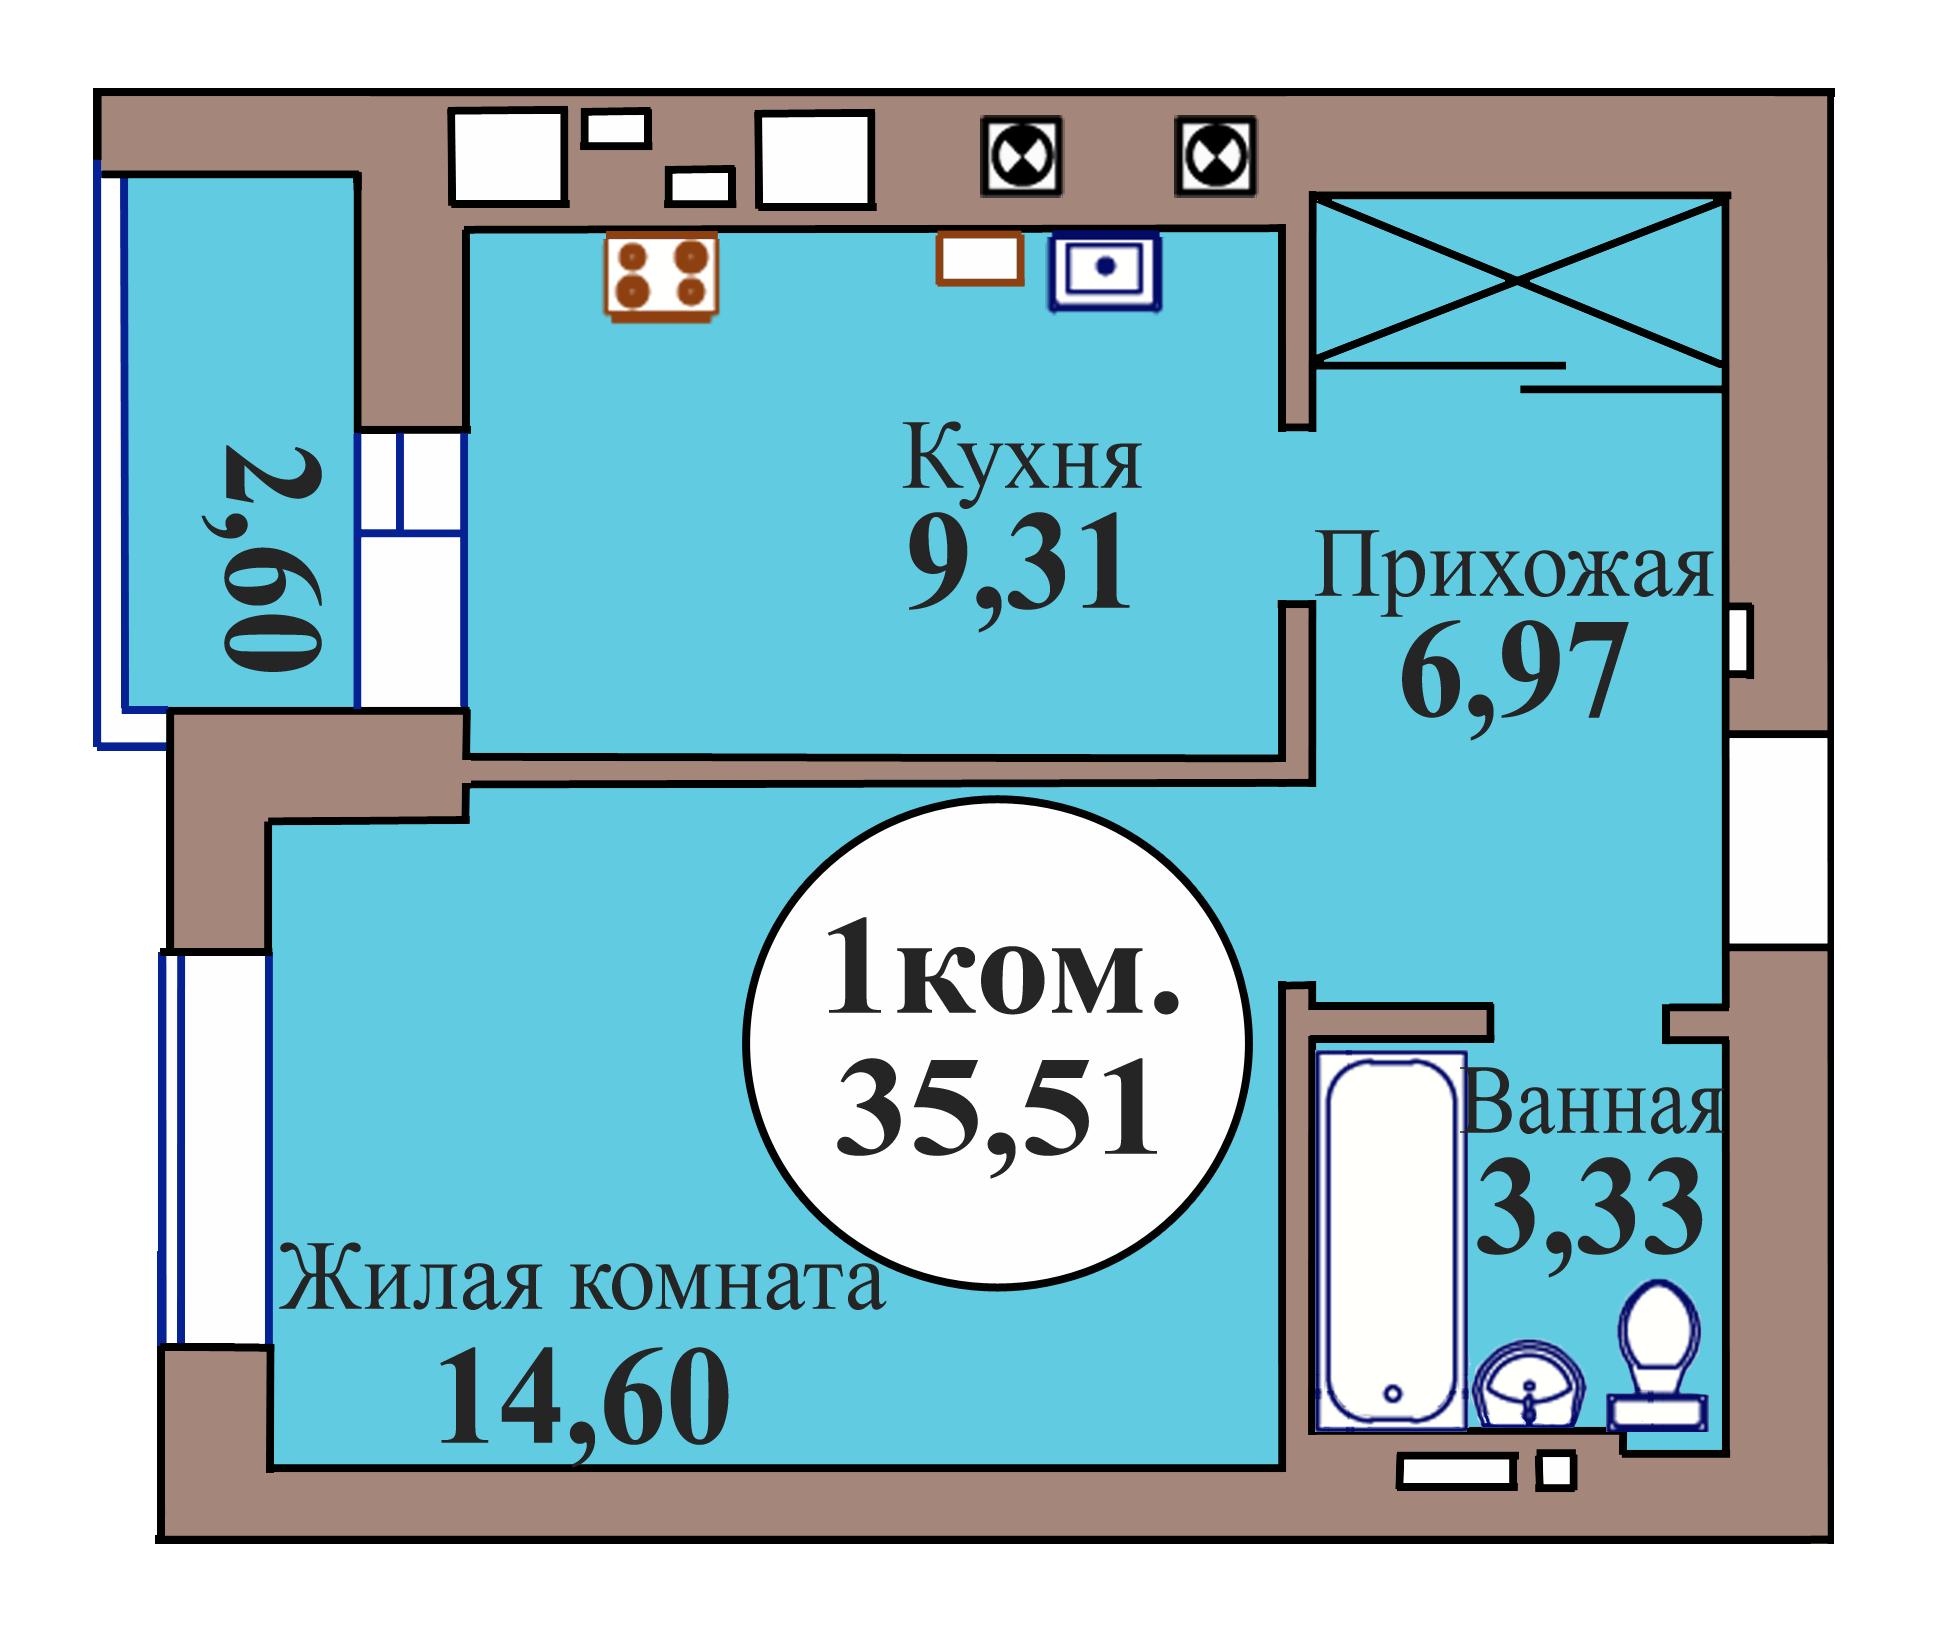 1-комн. кв. по пер. Калининградский, 5 кв. 22 в Калининграде